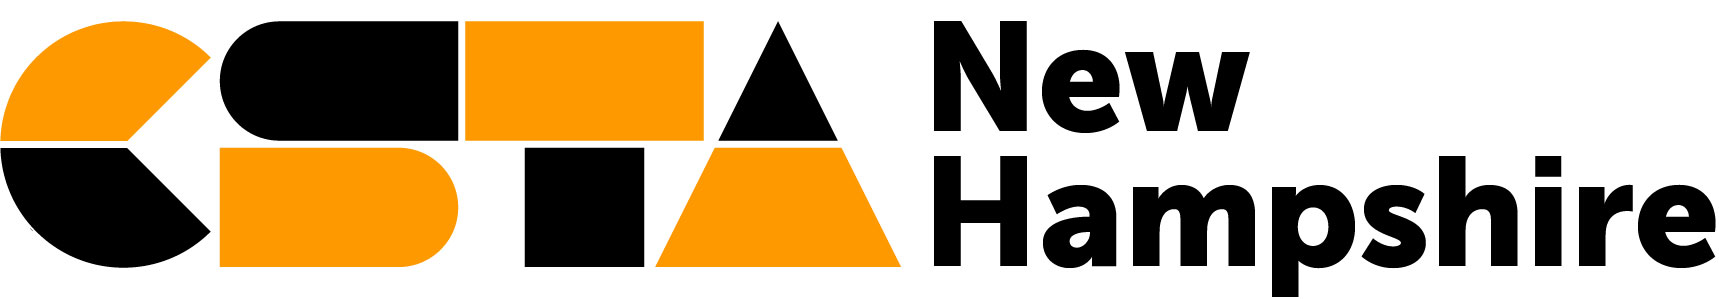 CSTA New Hampshire logo